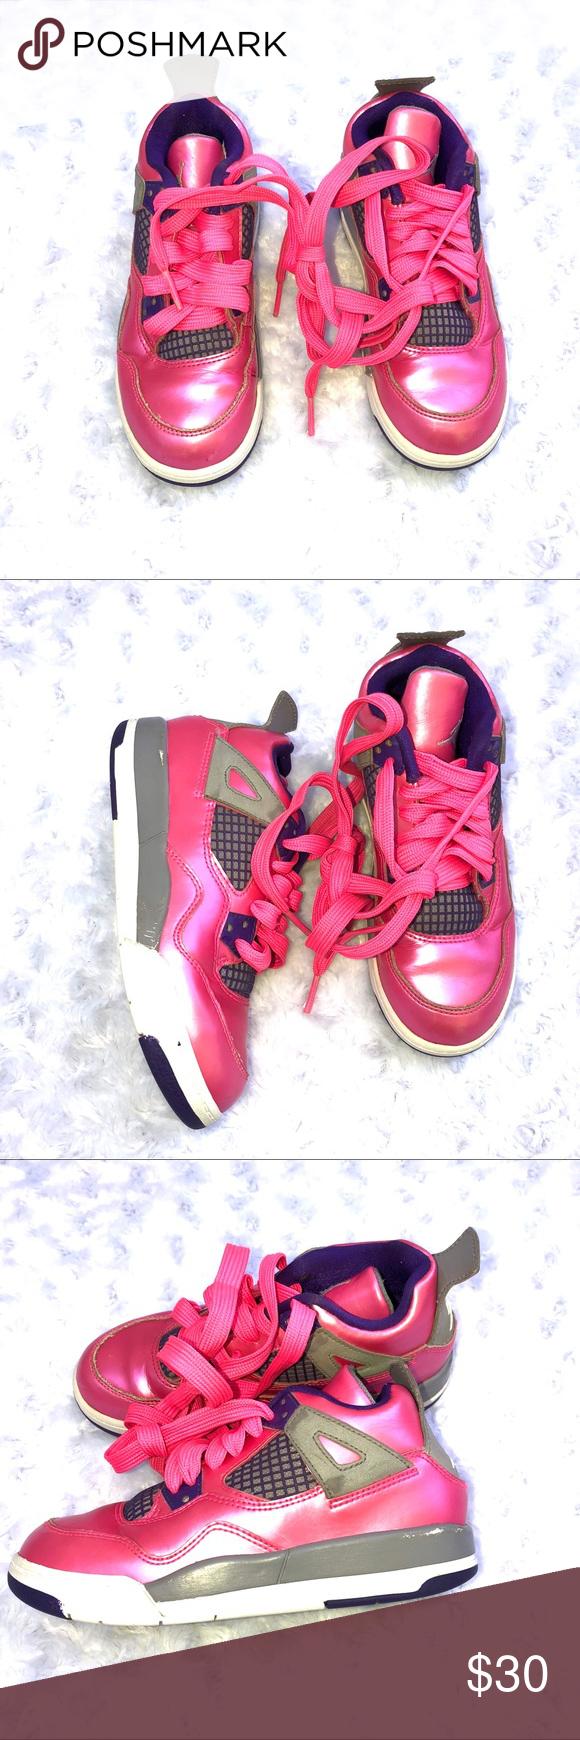 2ca500e5708 ... Girls Nike Jordan Sneakers size 13 Girls Jordan Sneakers size 13 Good  condition Nike Shoes Sneakers ...